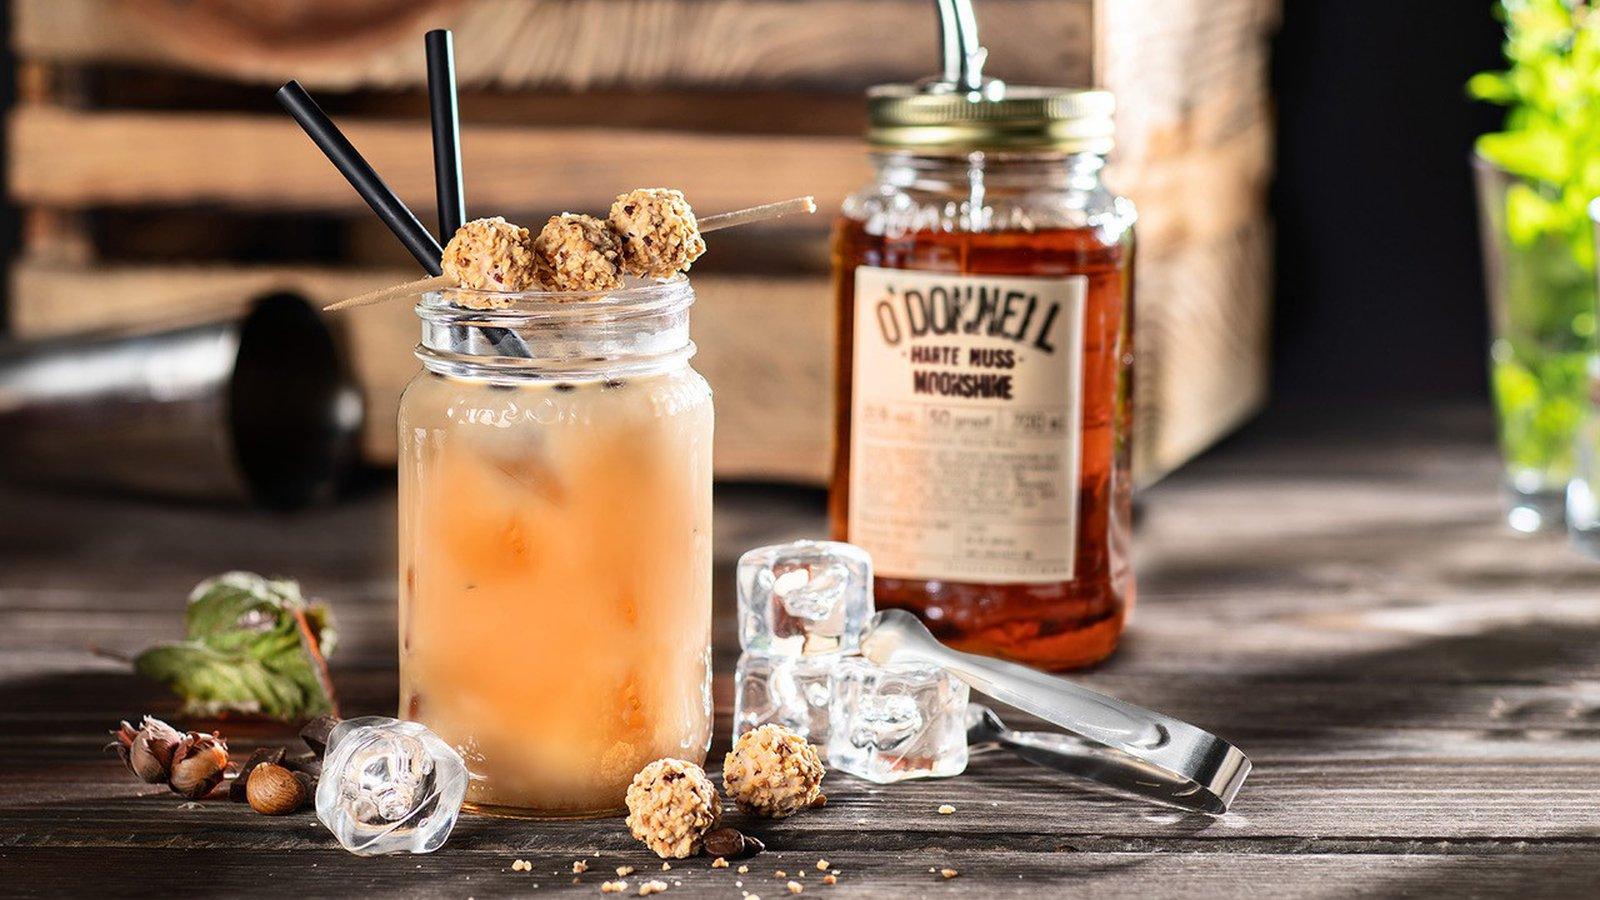 O'Donnell Moonshine - Schnaps, kein Honig